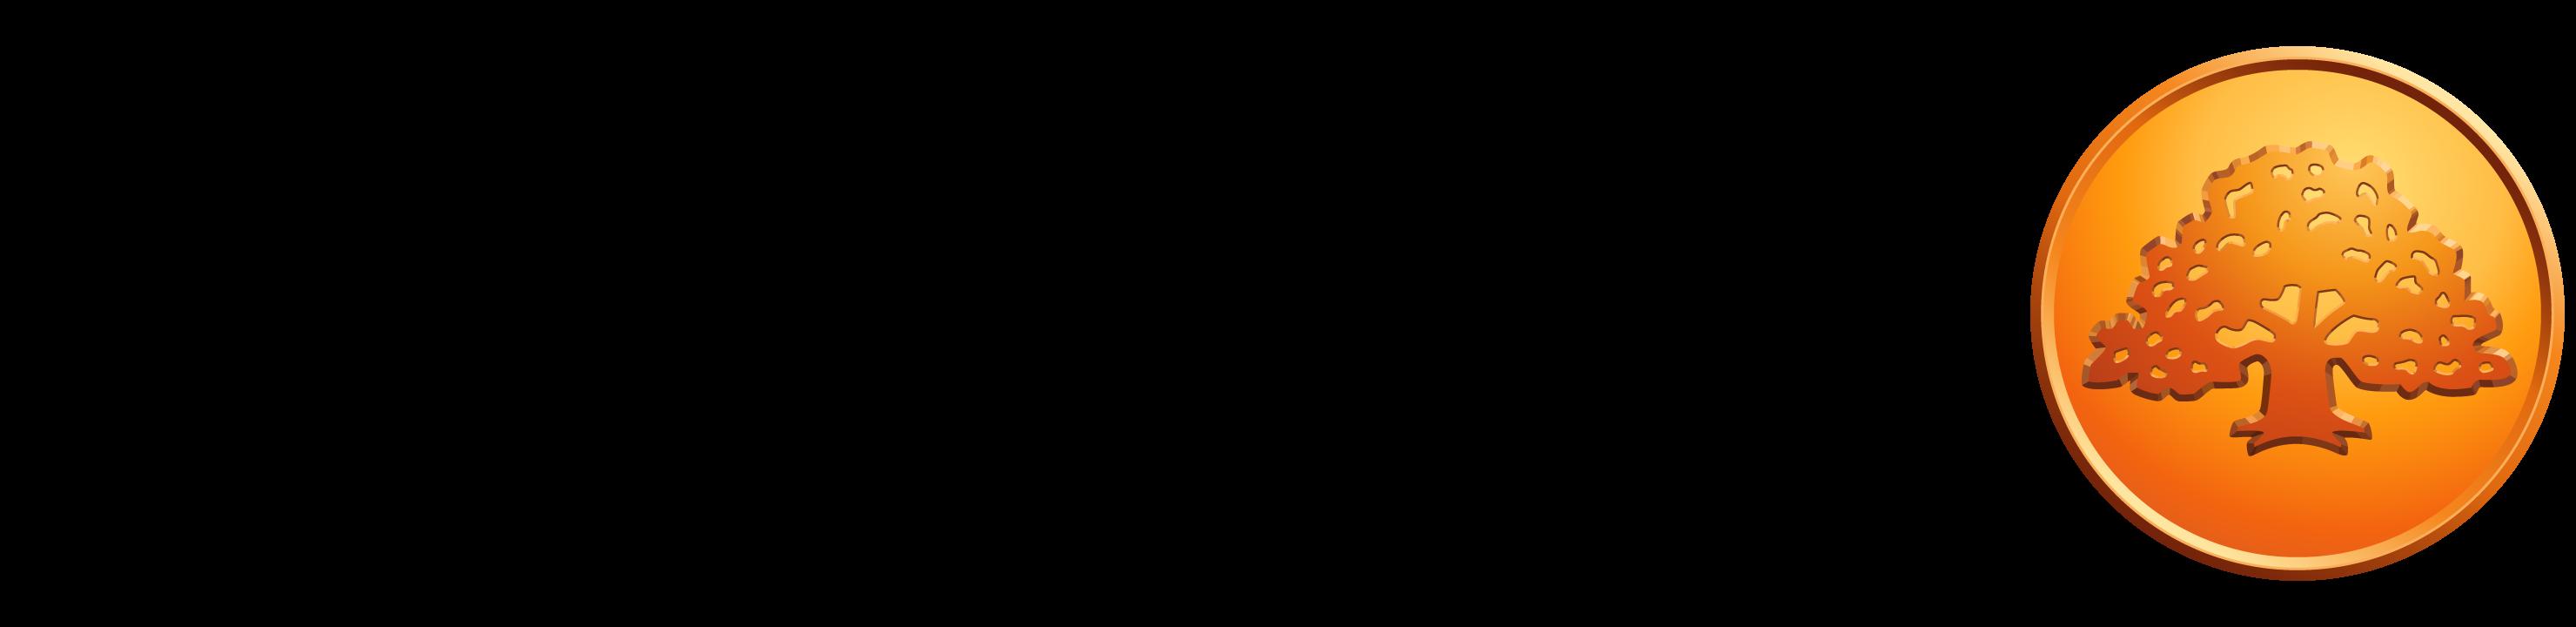 logotyp Westra Wermlands Sparbank